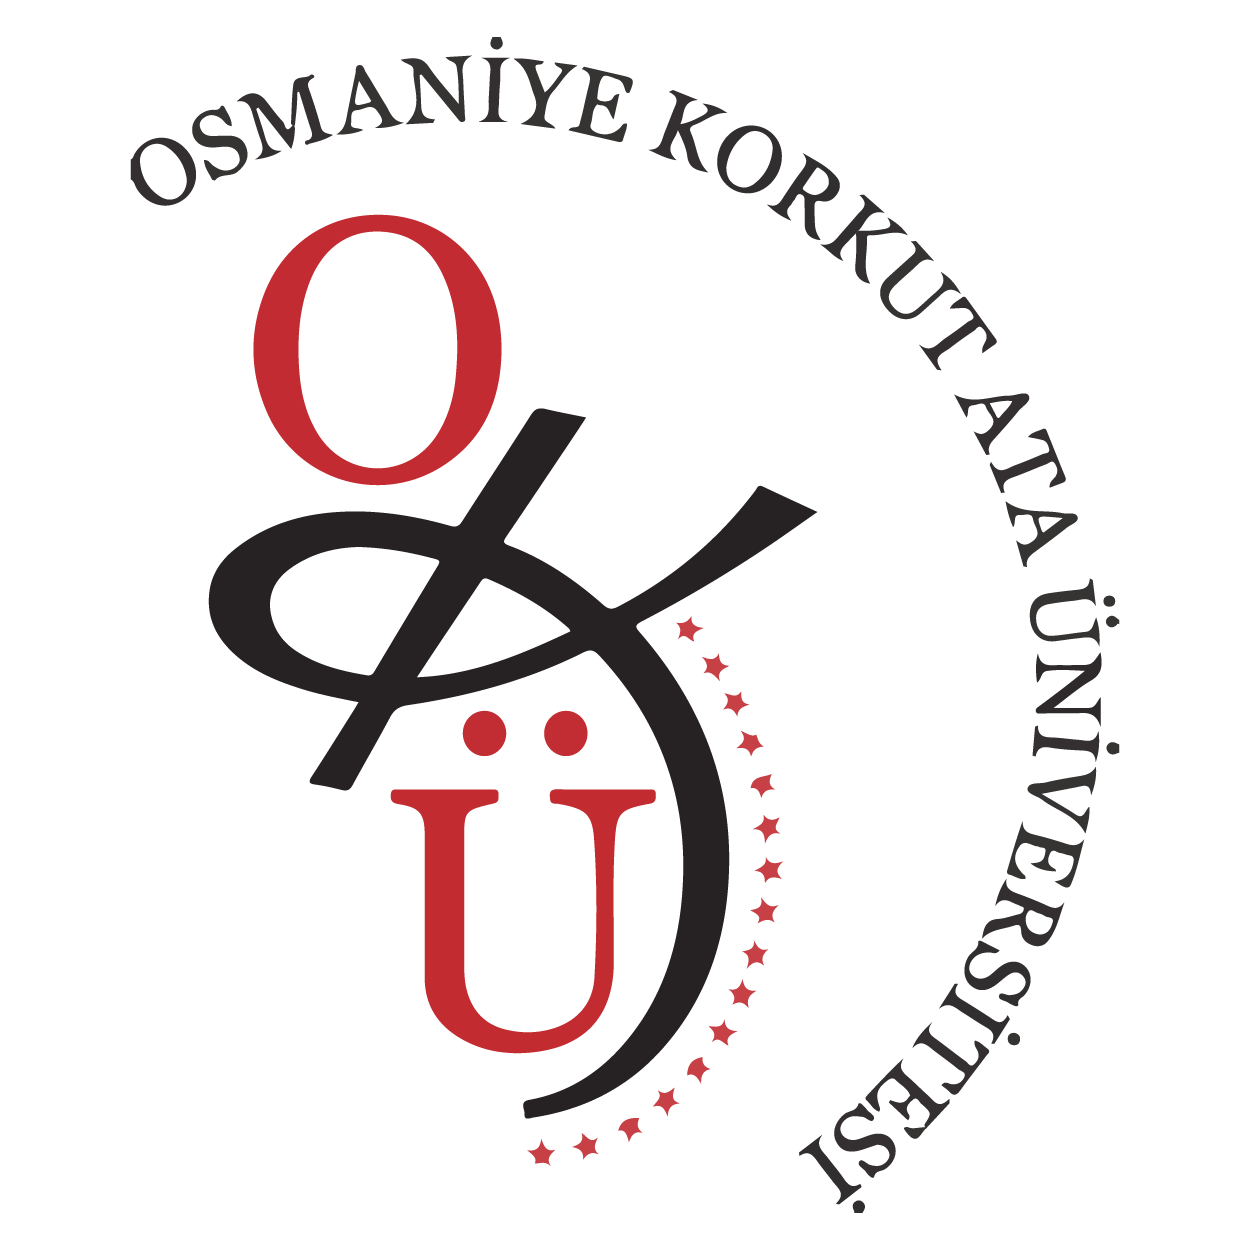 Osmaniye Korkut Ata Üniversitesi Logo png